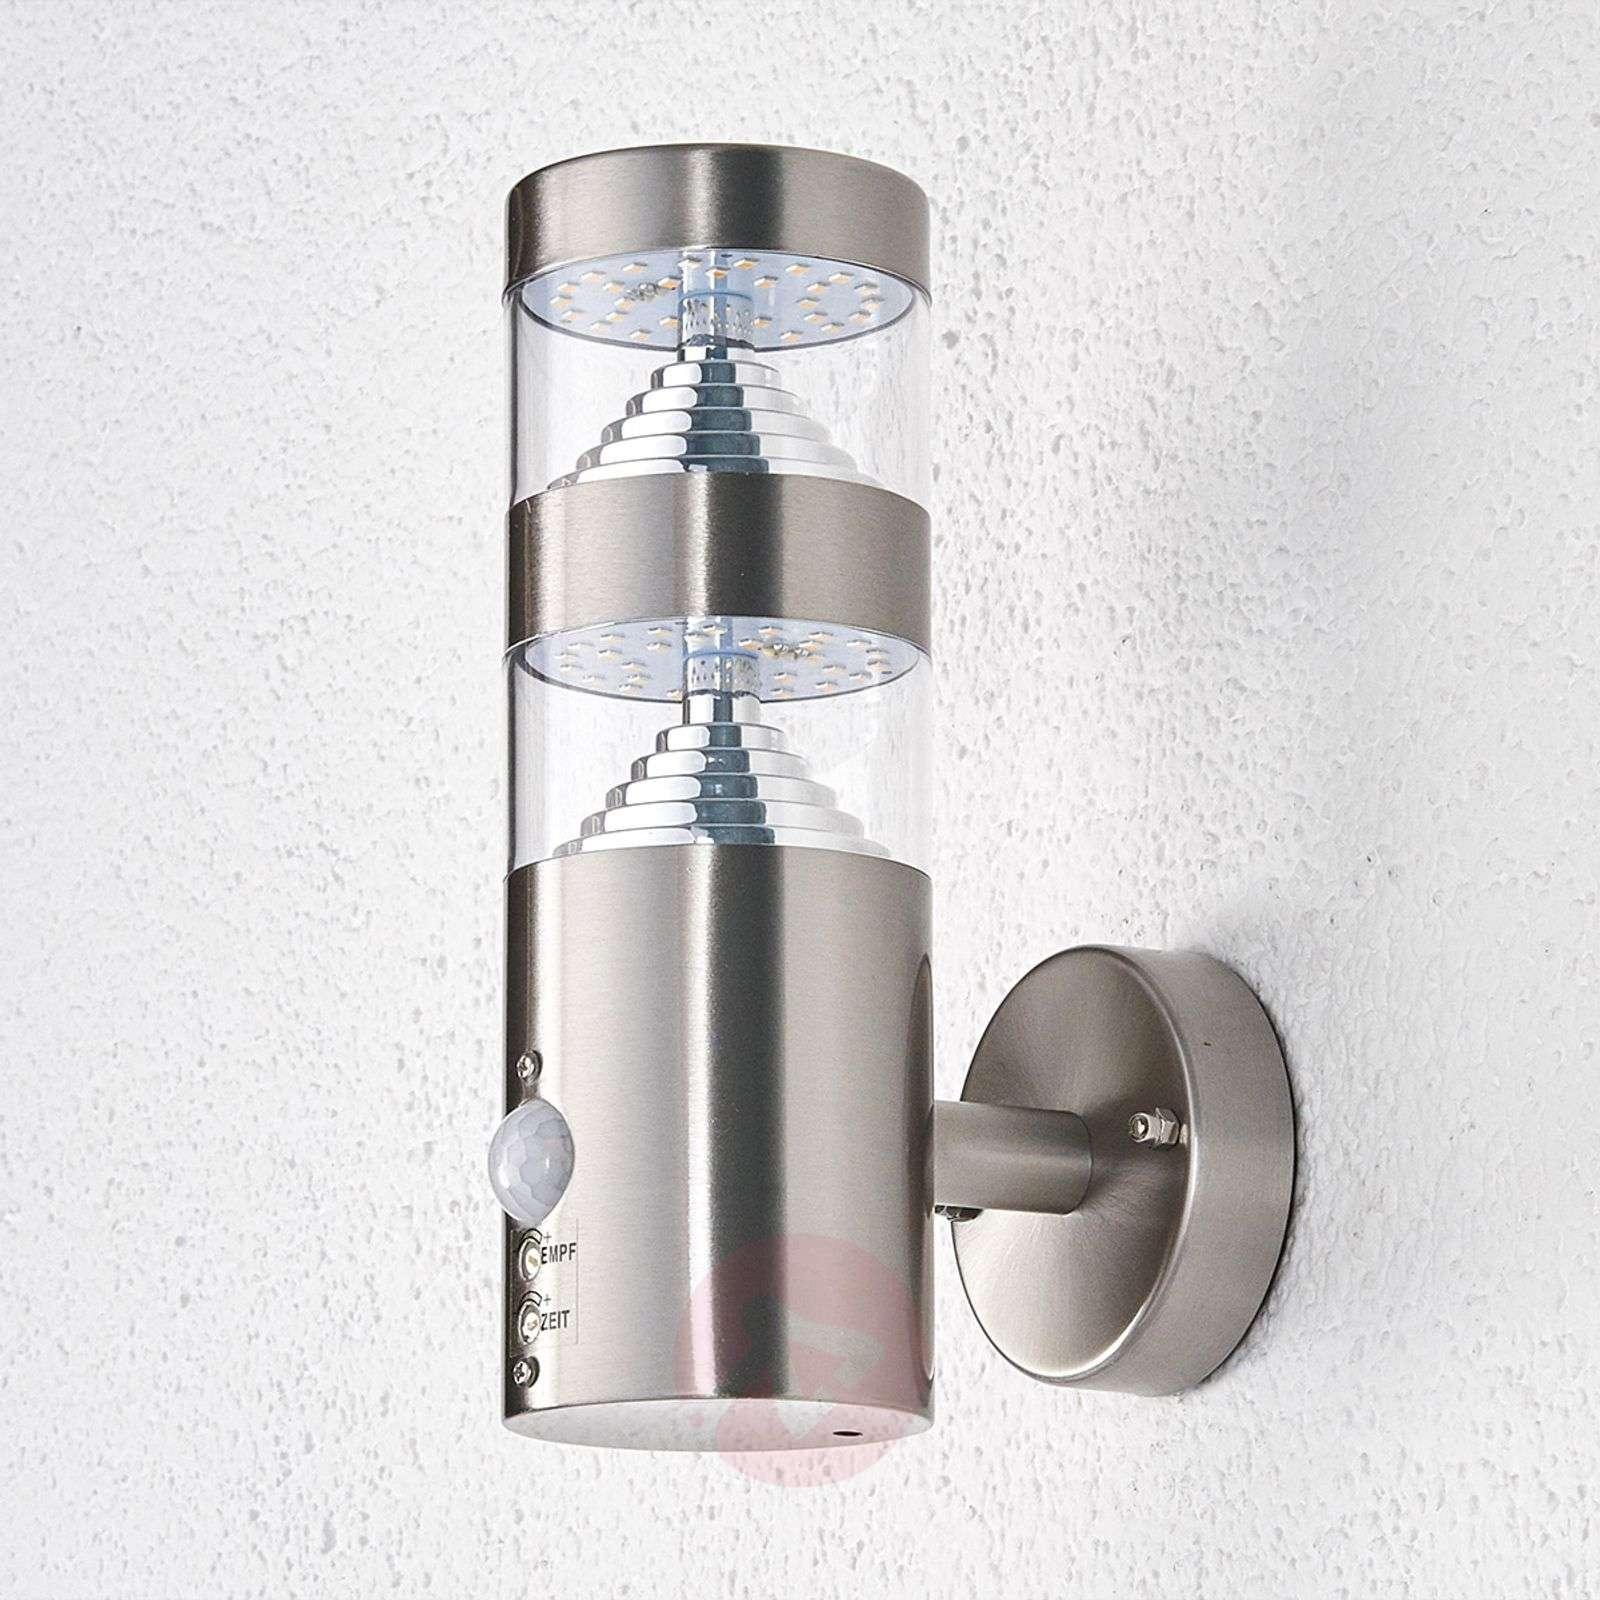 Lanea LED outdoor wall light, straight, sensor-9988006-02